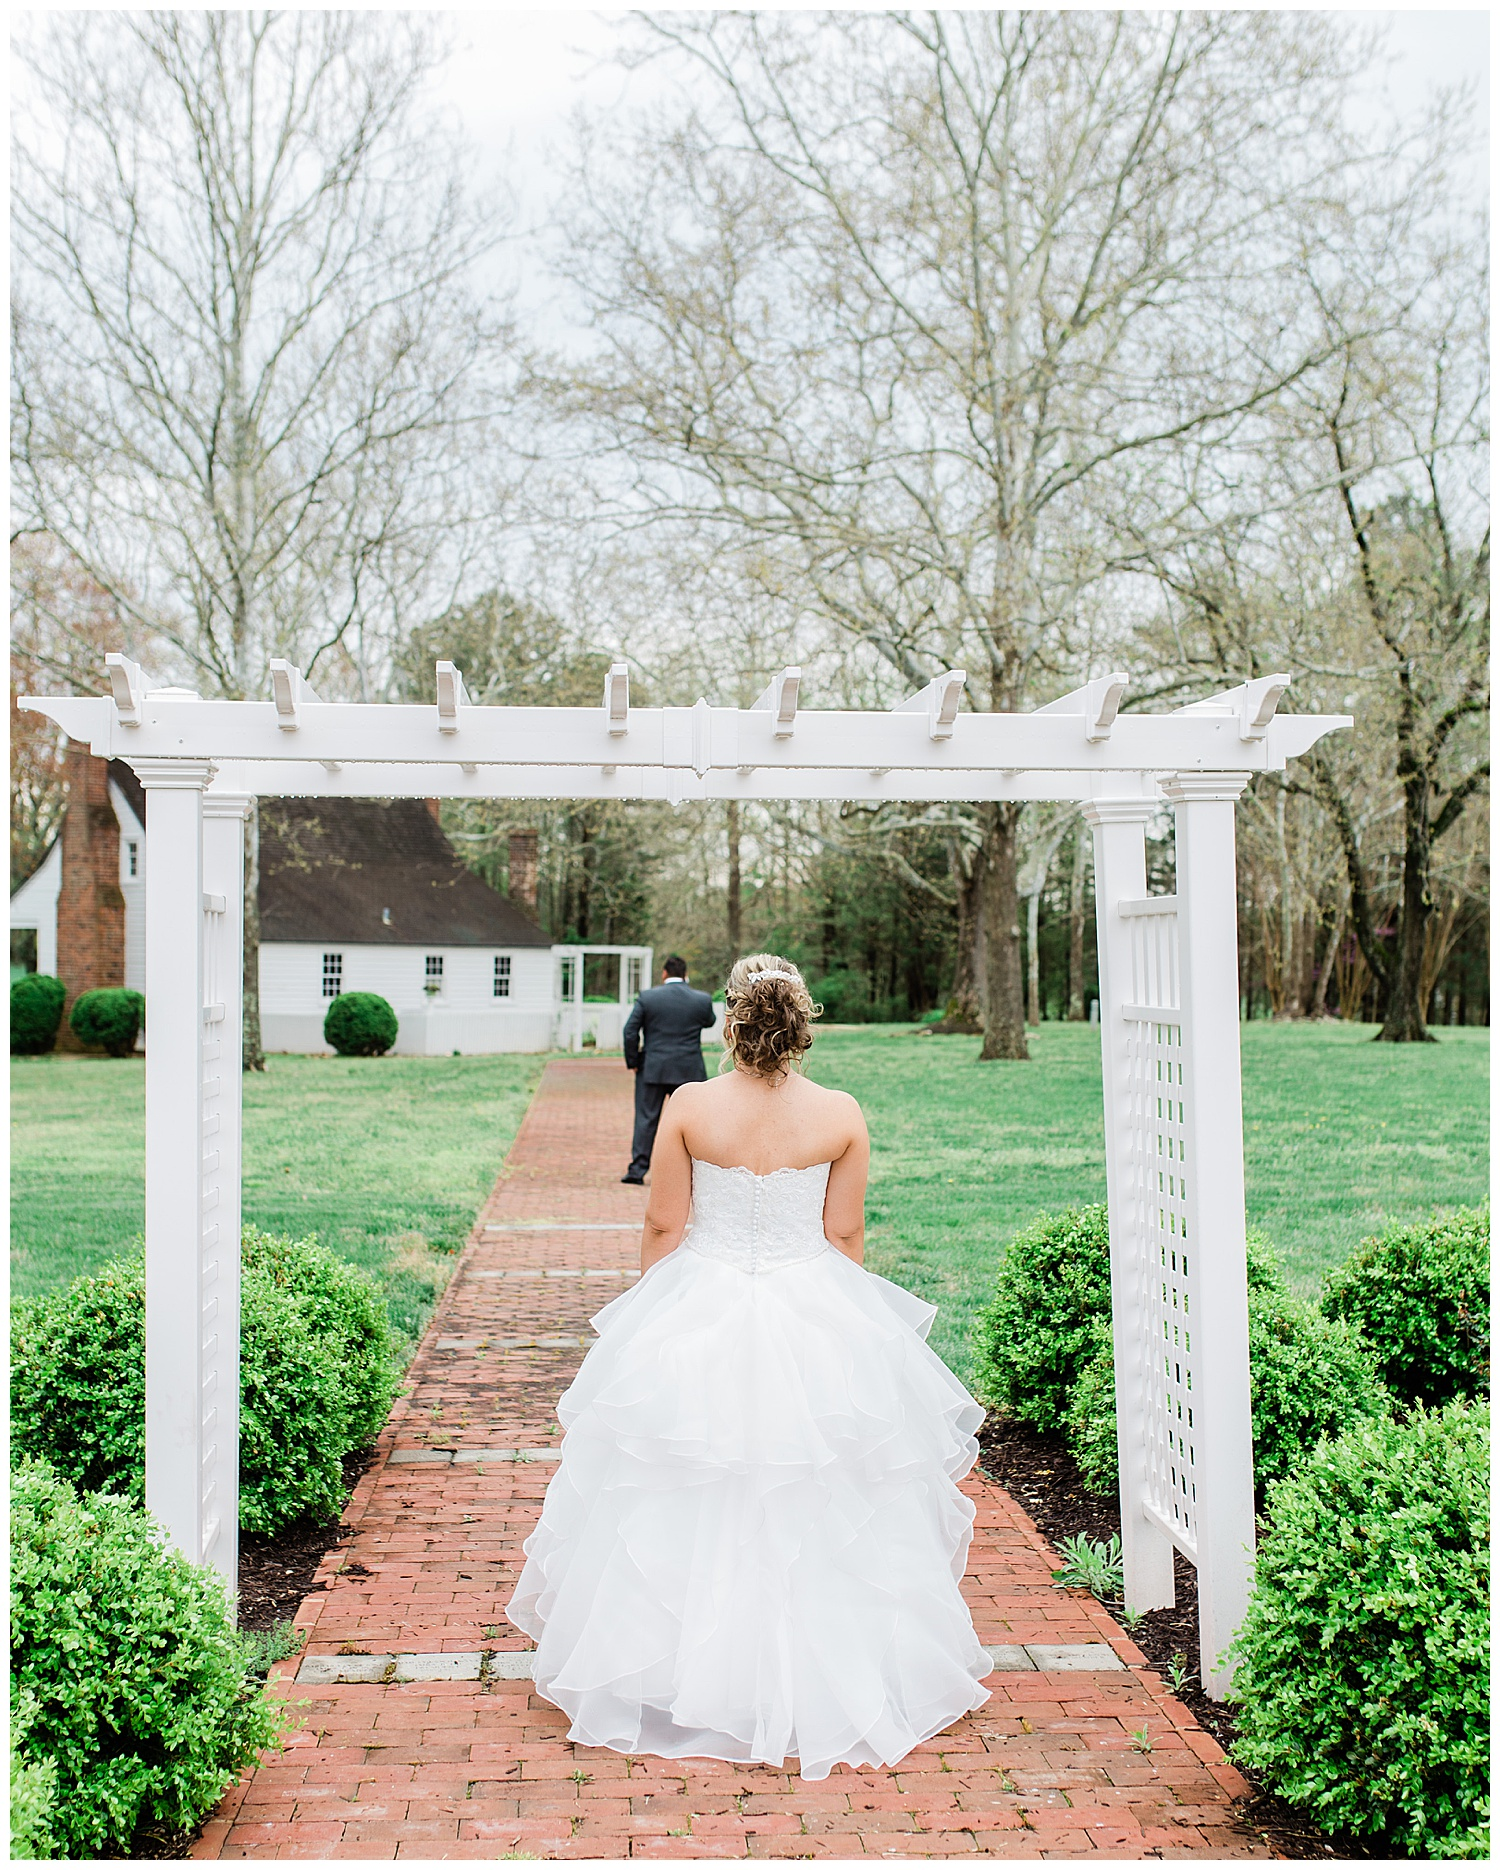 Wedding First Look - Virginia Wedding Photographer